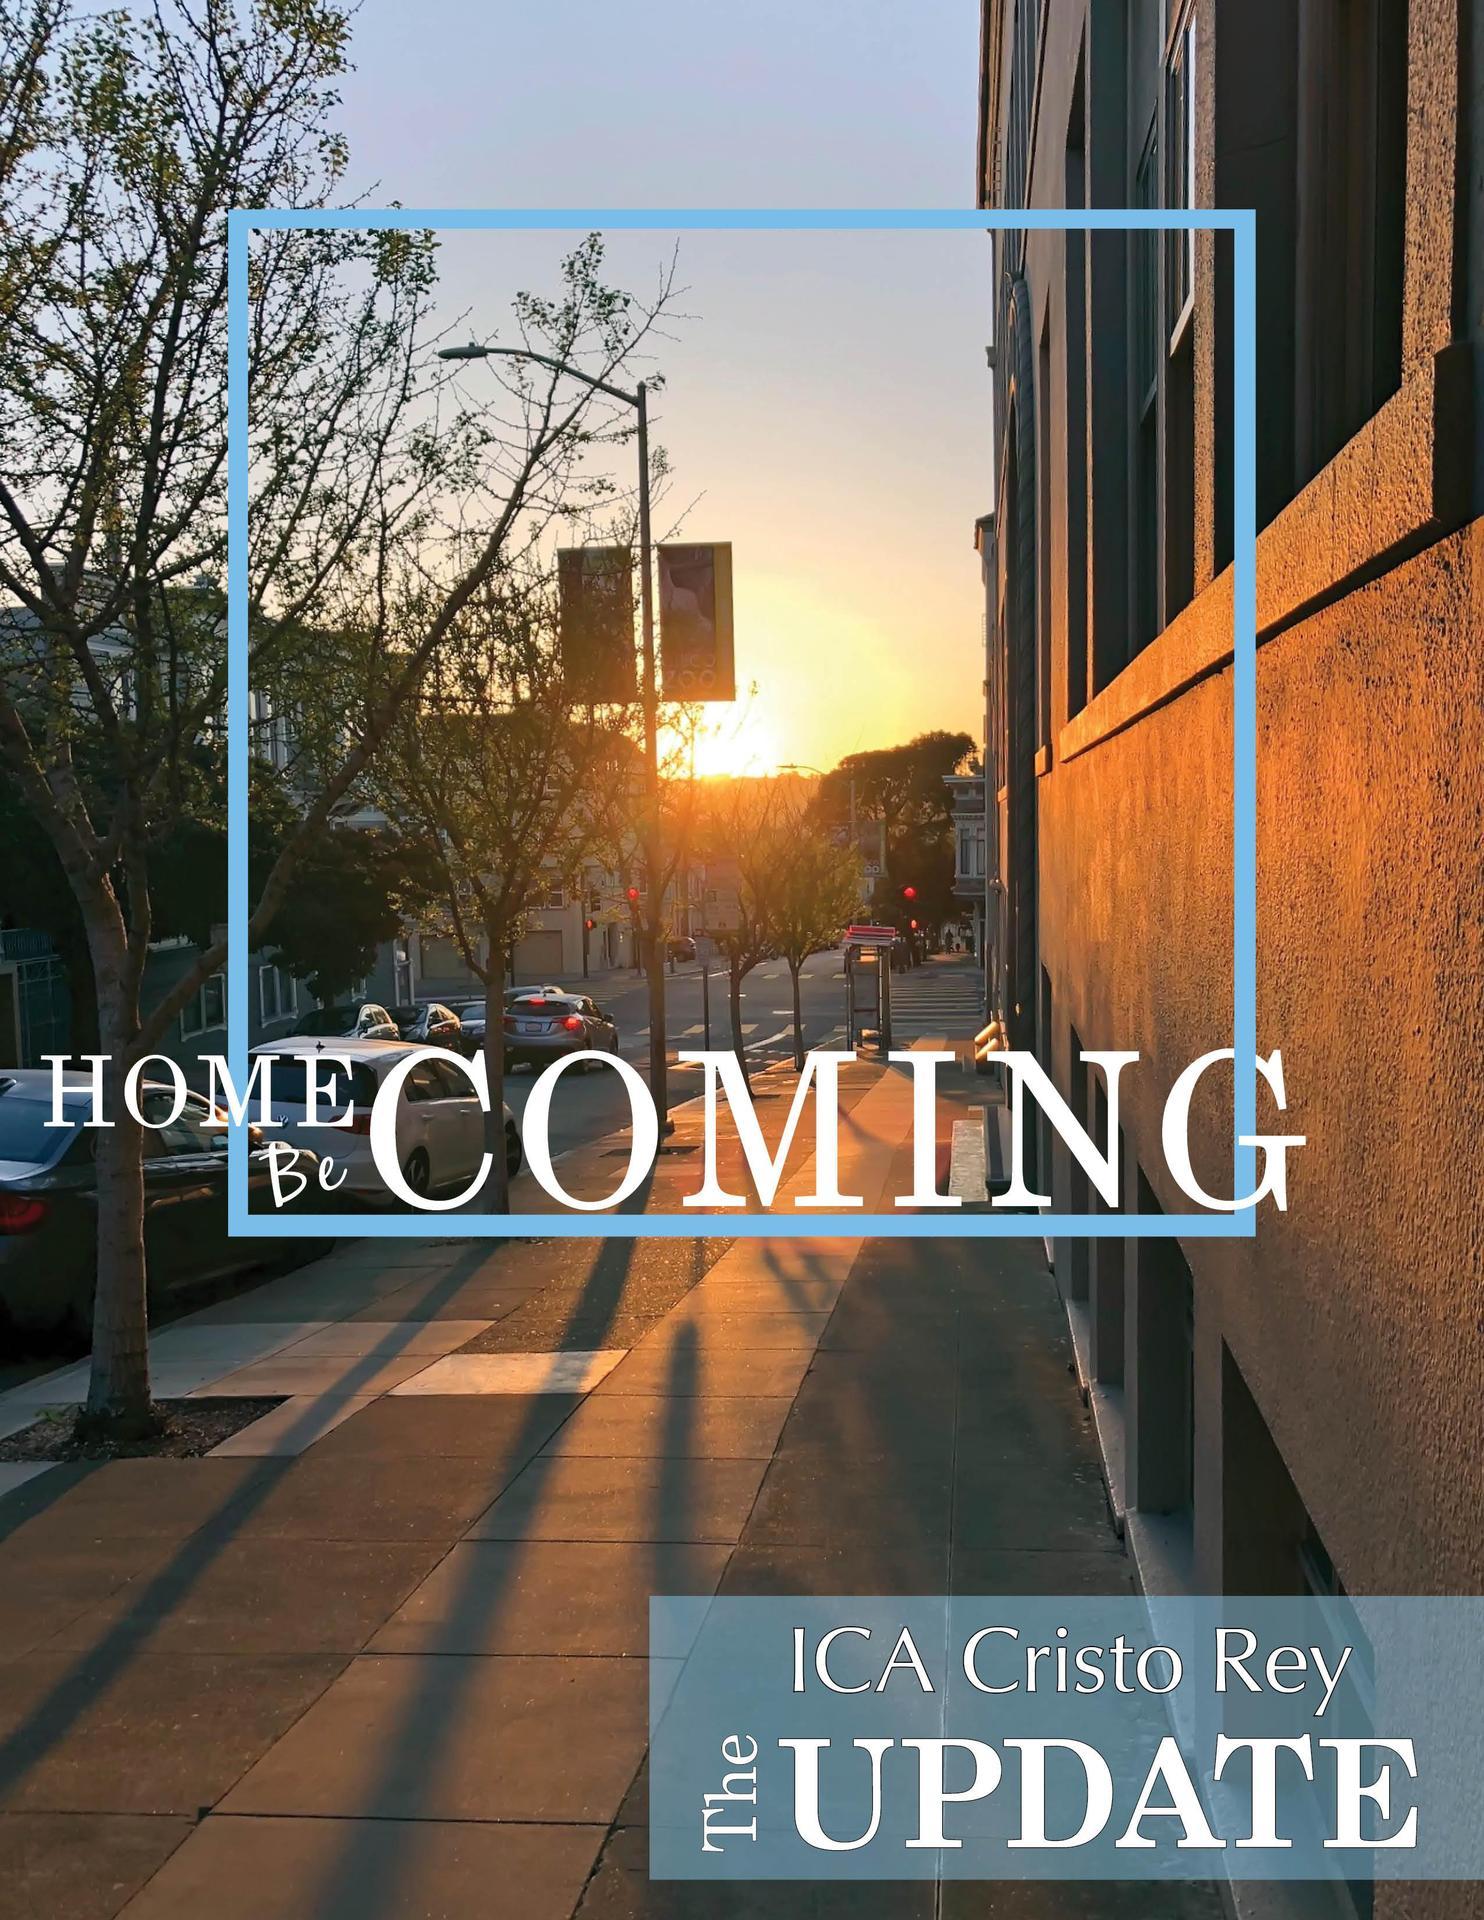 The ICA Cristo Rey Update | Winter 2018 | No. 113